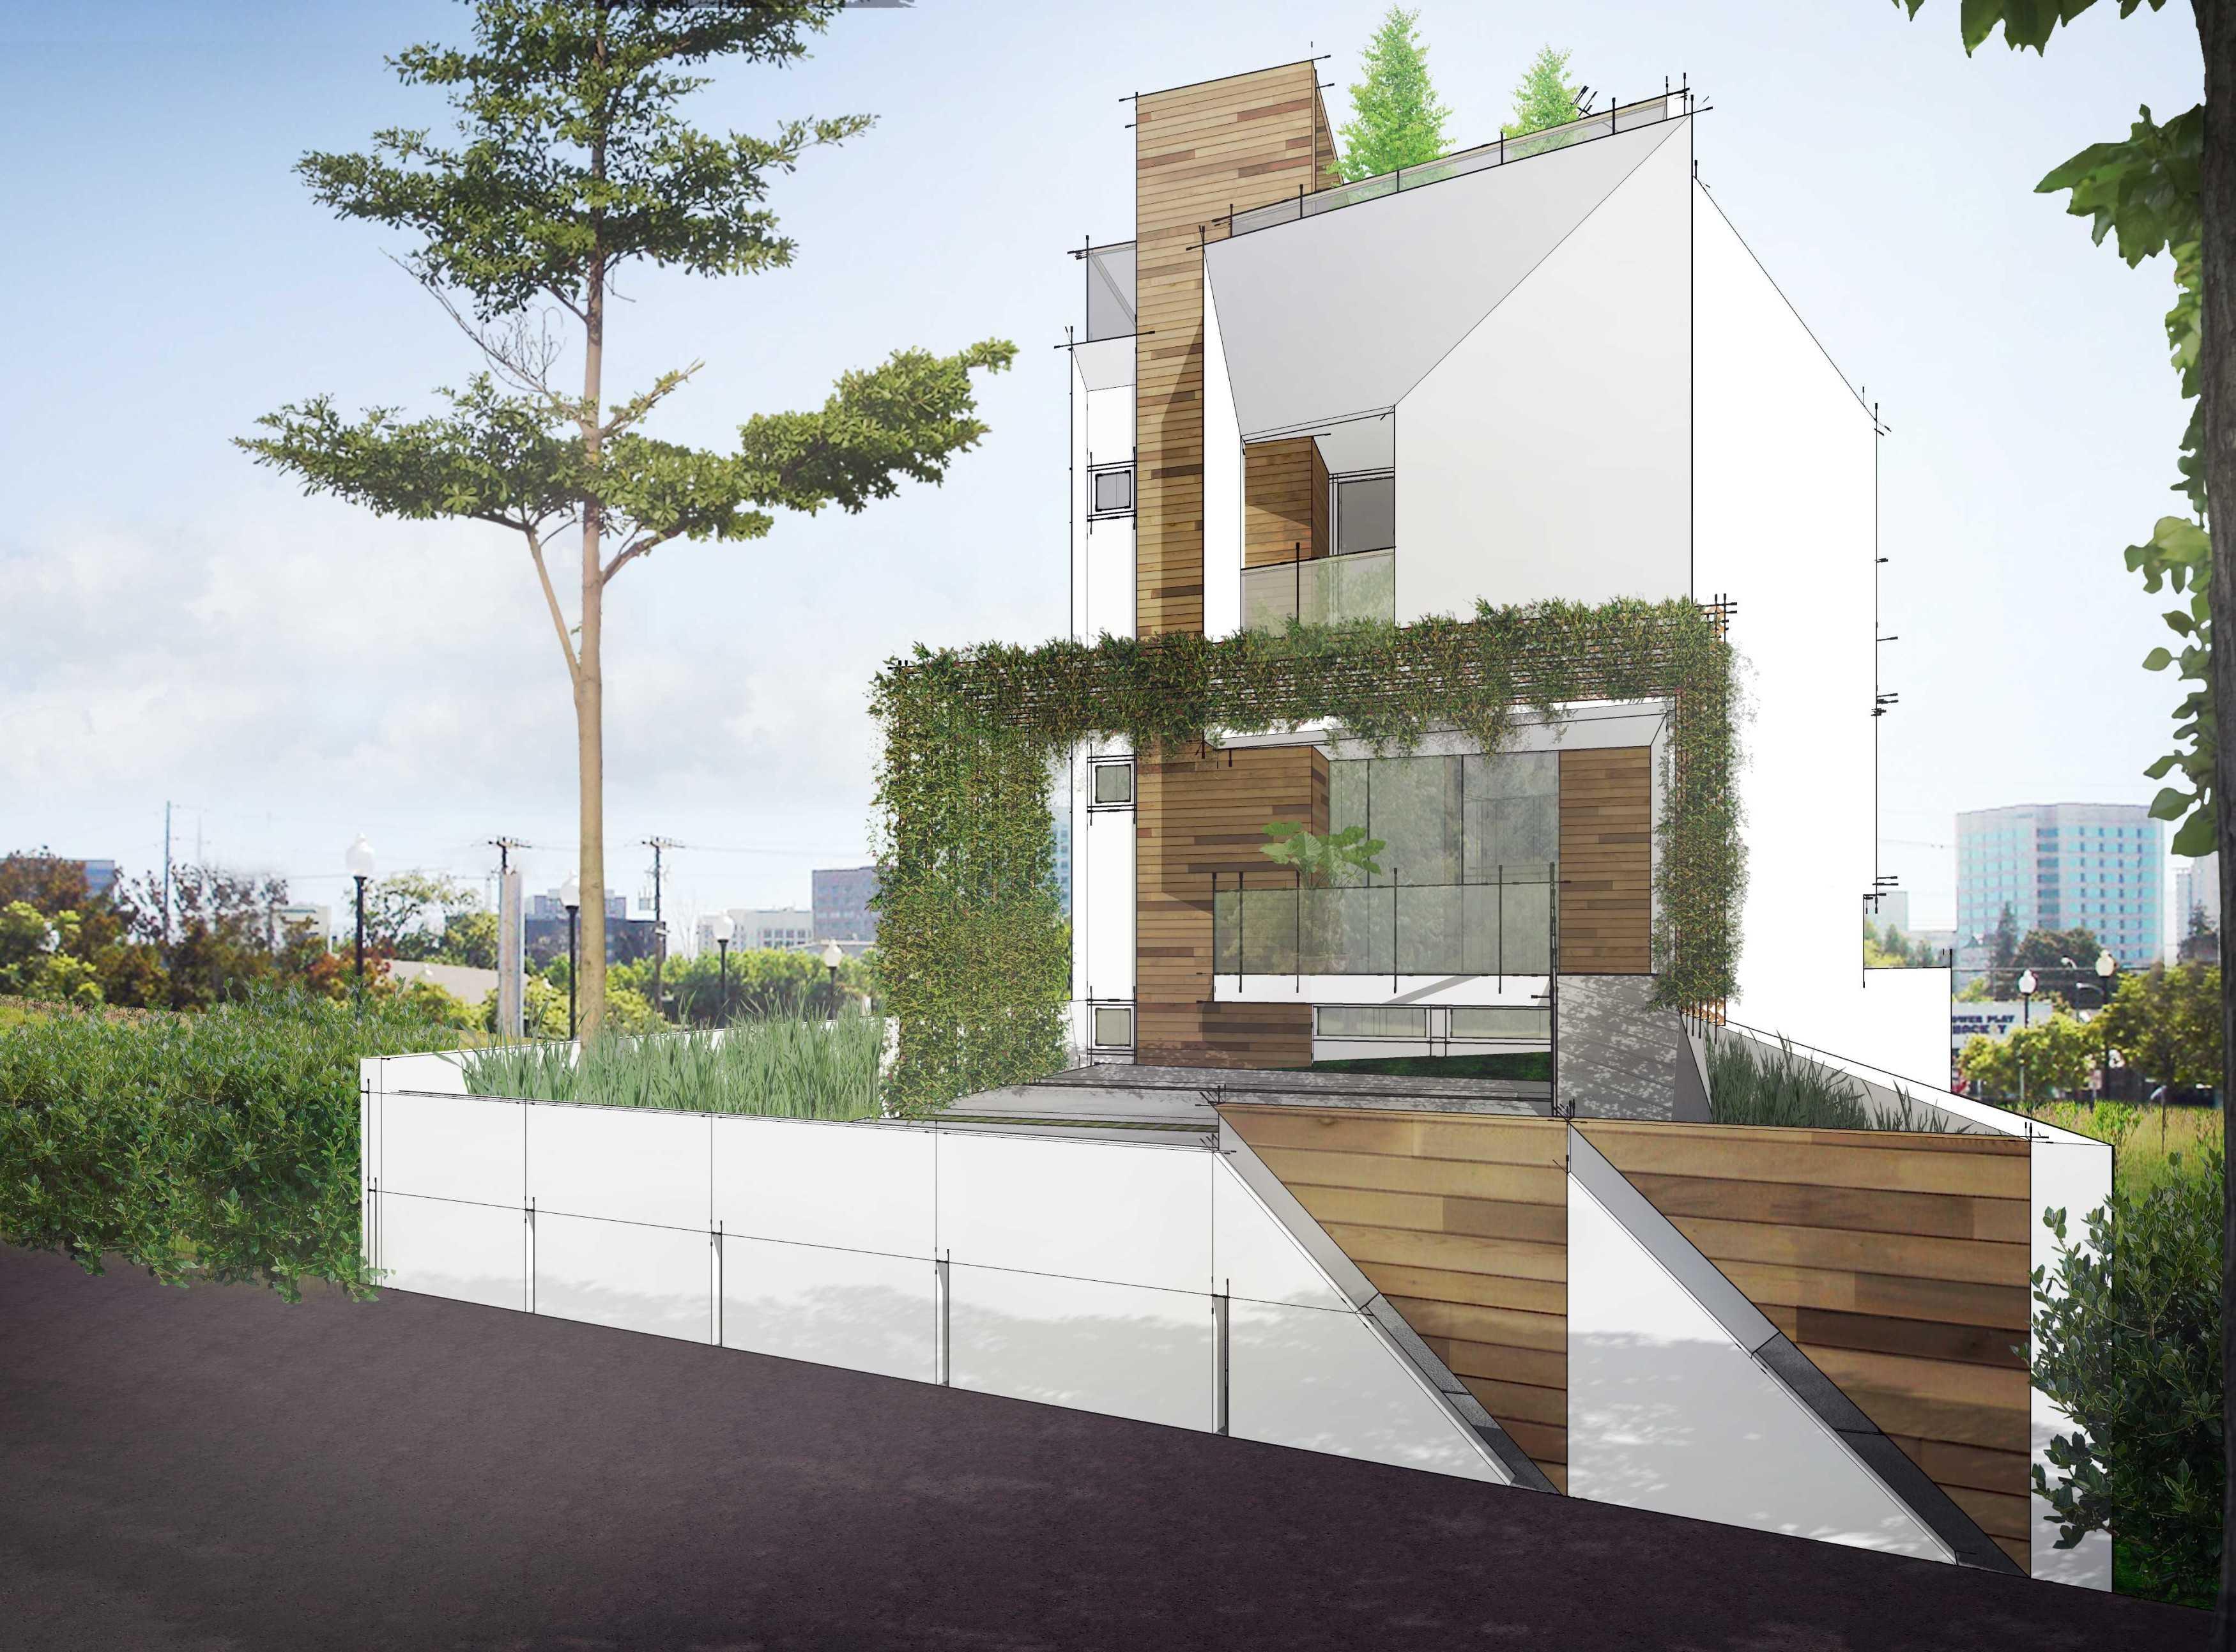 Gubah Ruang Studio G&i Residence Bandung, Kota Bandung, Jawa Barat, Indonesia Bandung, Kota Bandung, Jawa Barat, Indonesia Exterior View Kontemporer  50879